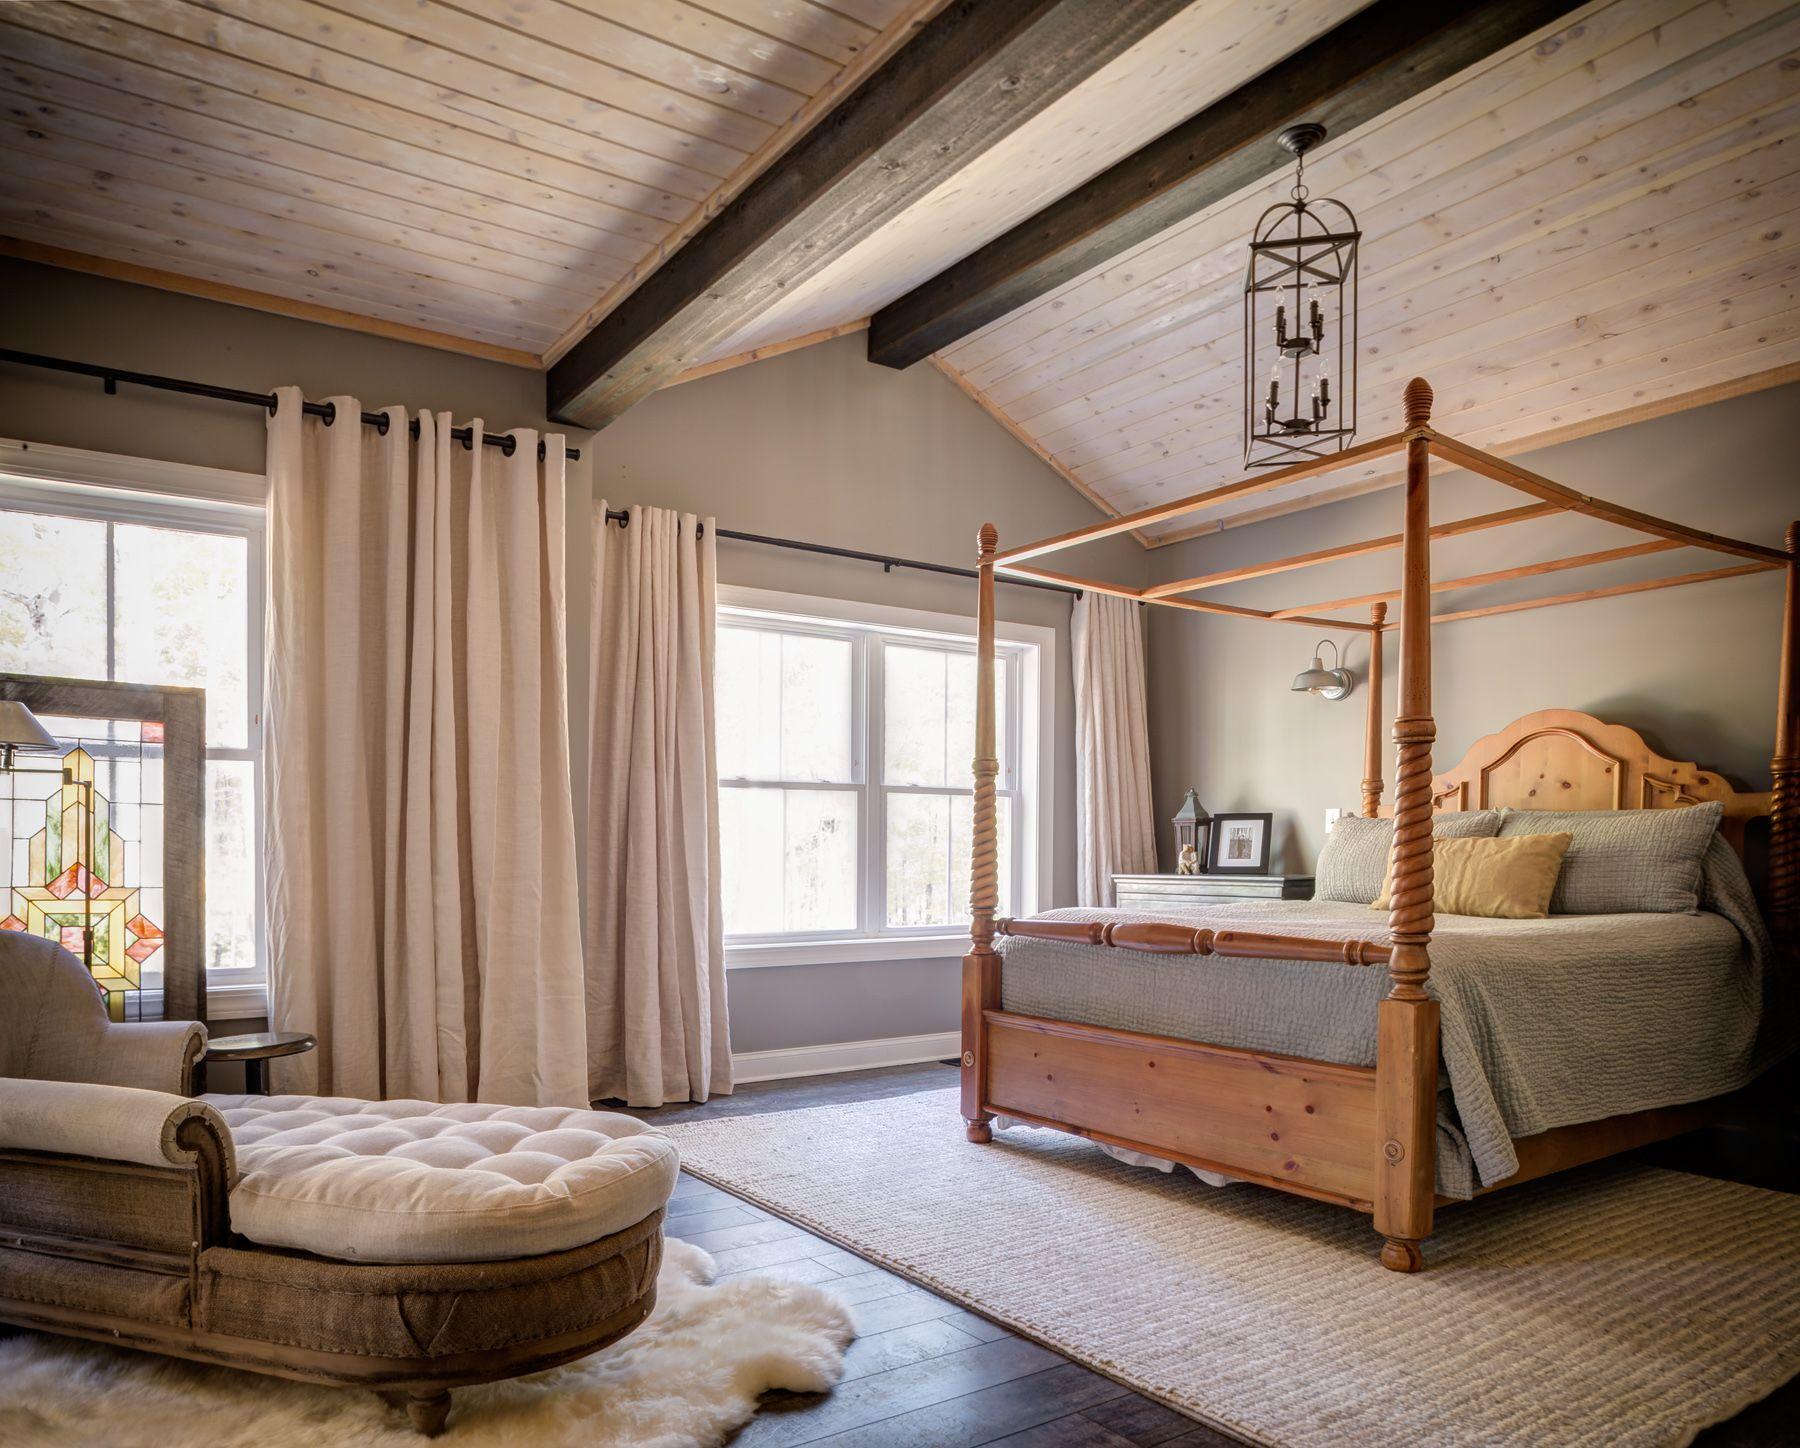 Master Suites Bedroom Pictures Schumacher Homes Pikes Peak Schumacherhomes Earnhardtcollection Visit A Design Studio Nearest You